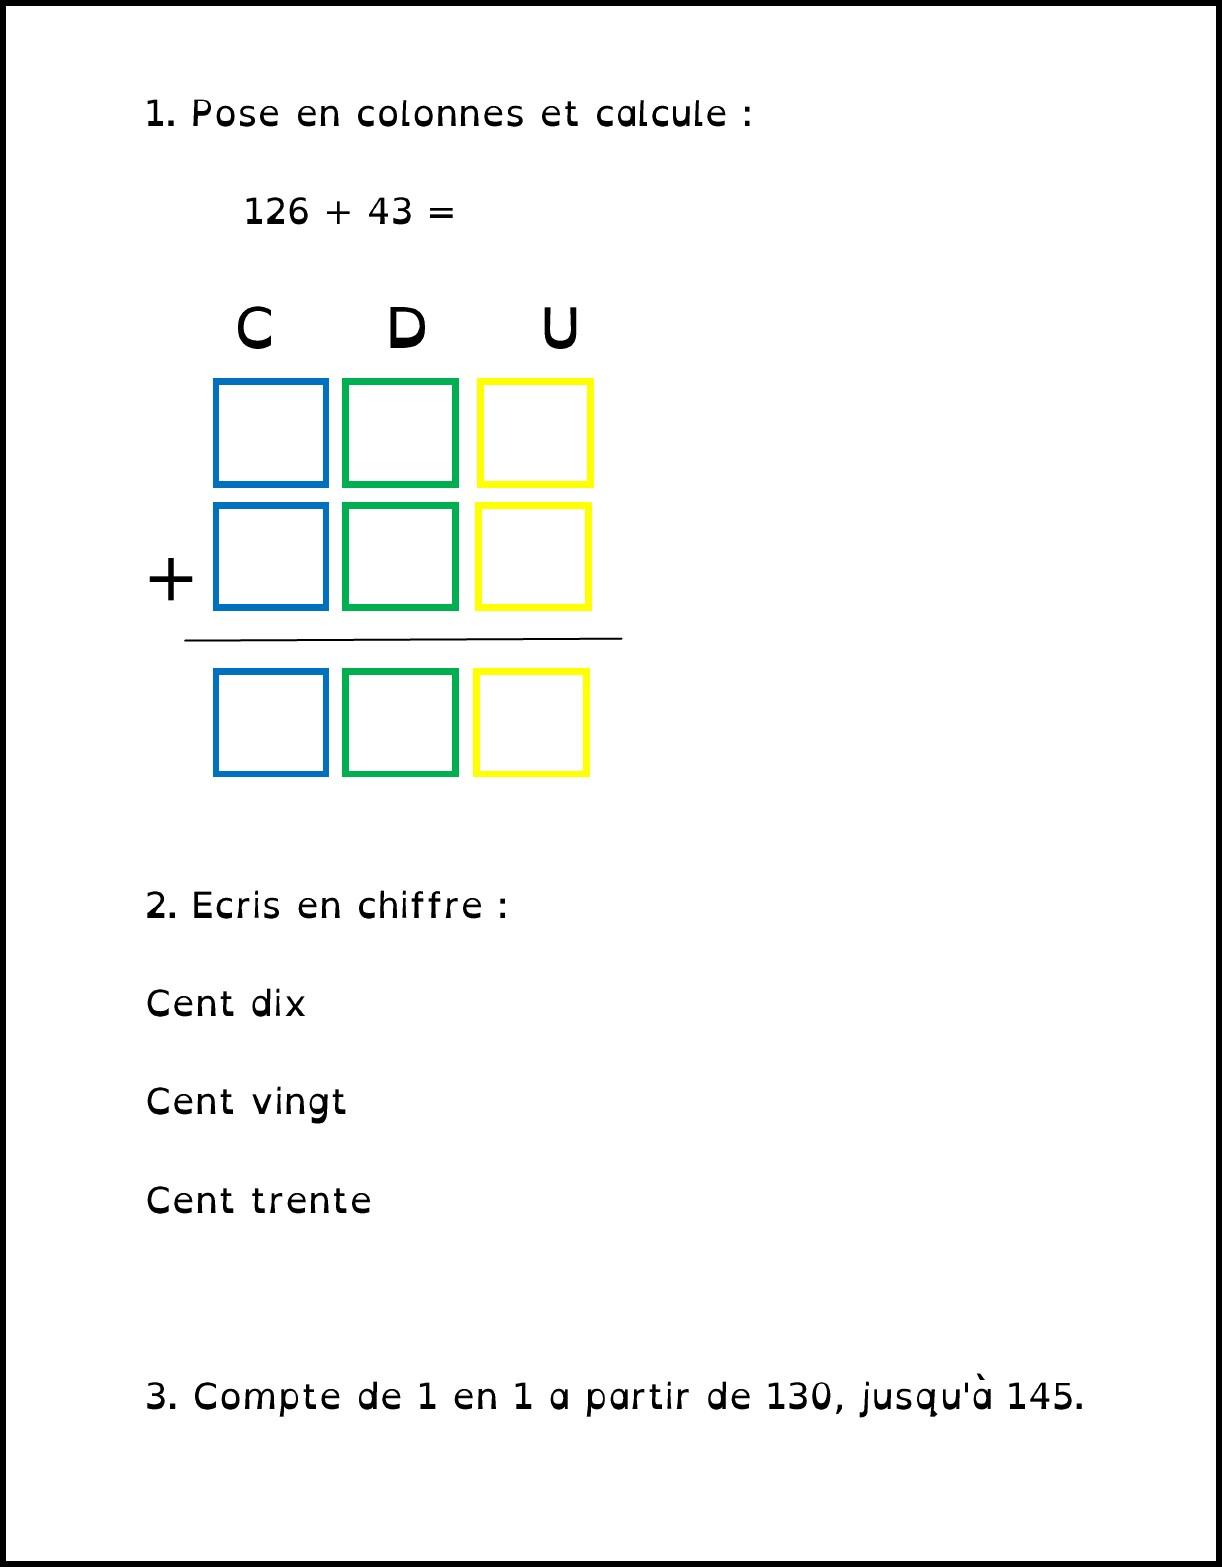 image addition et écriture nbrs